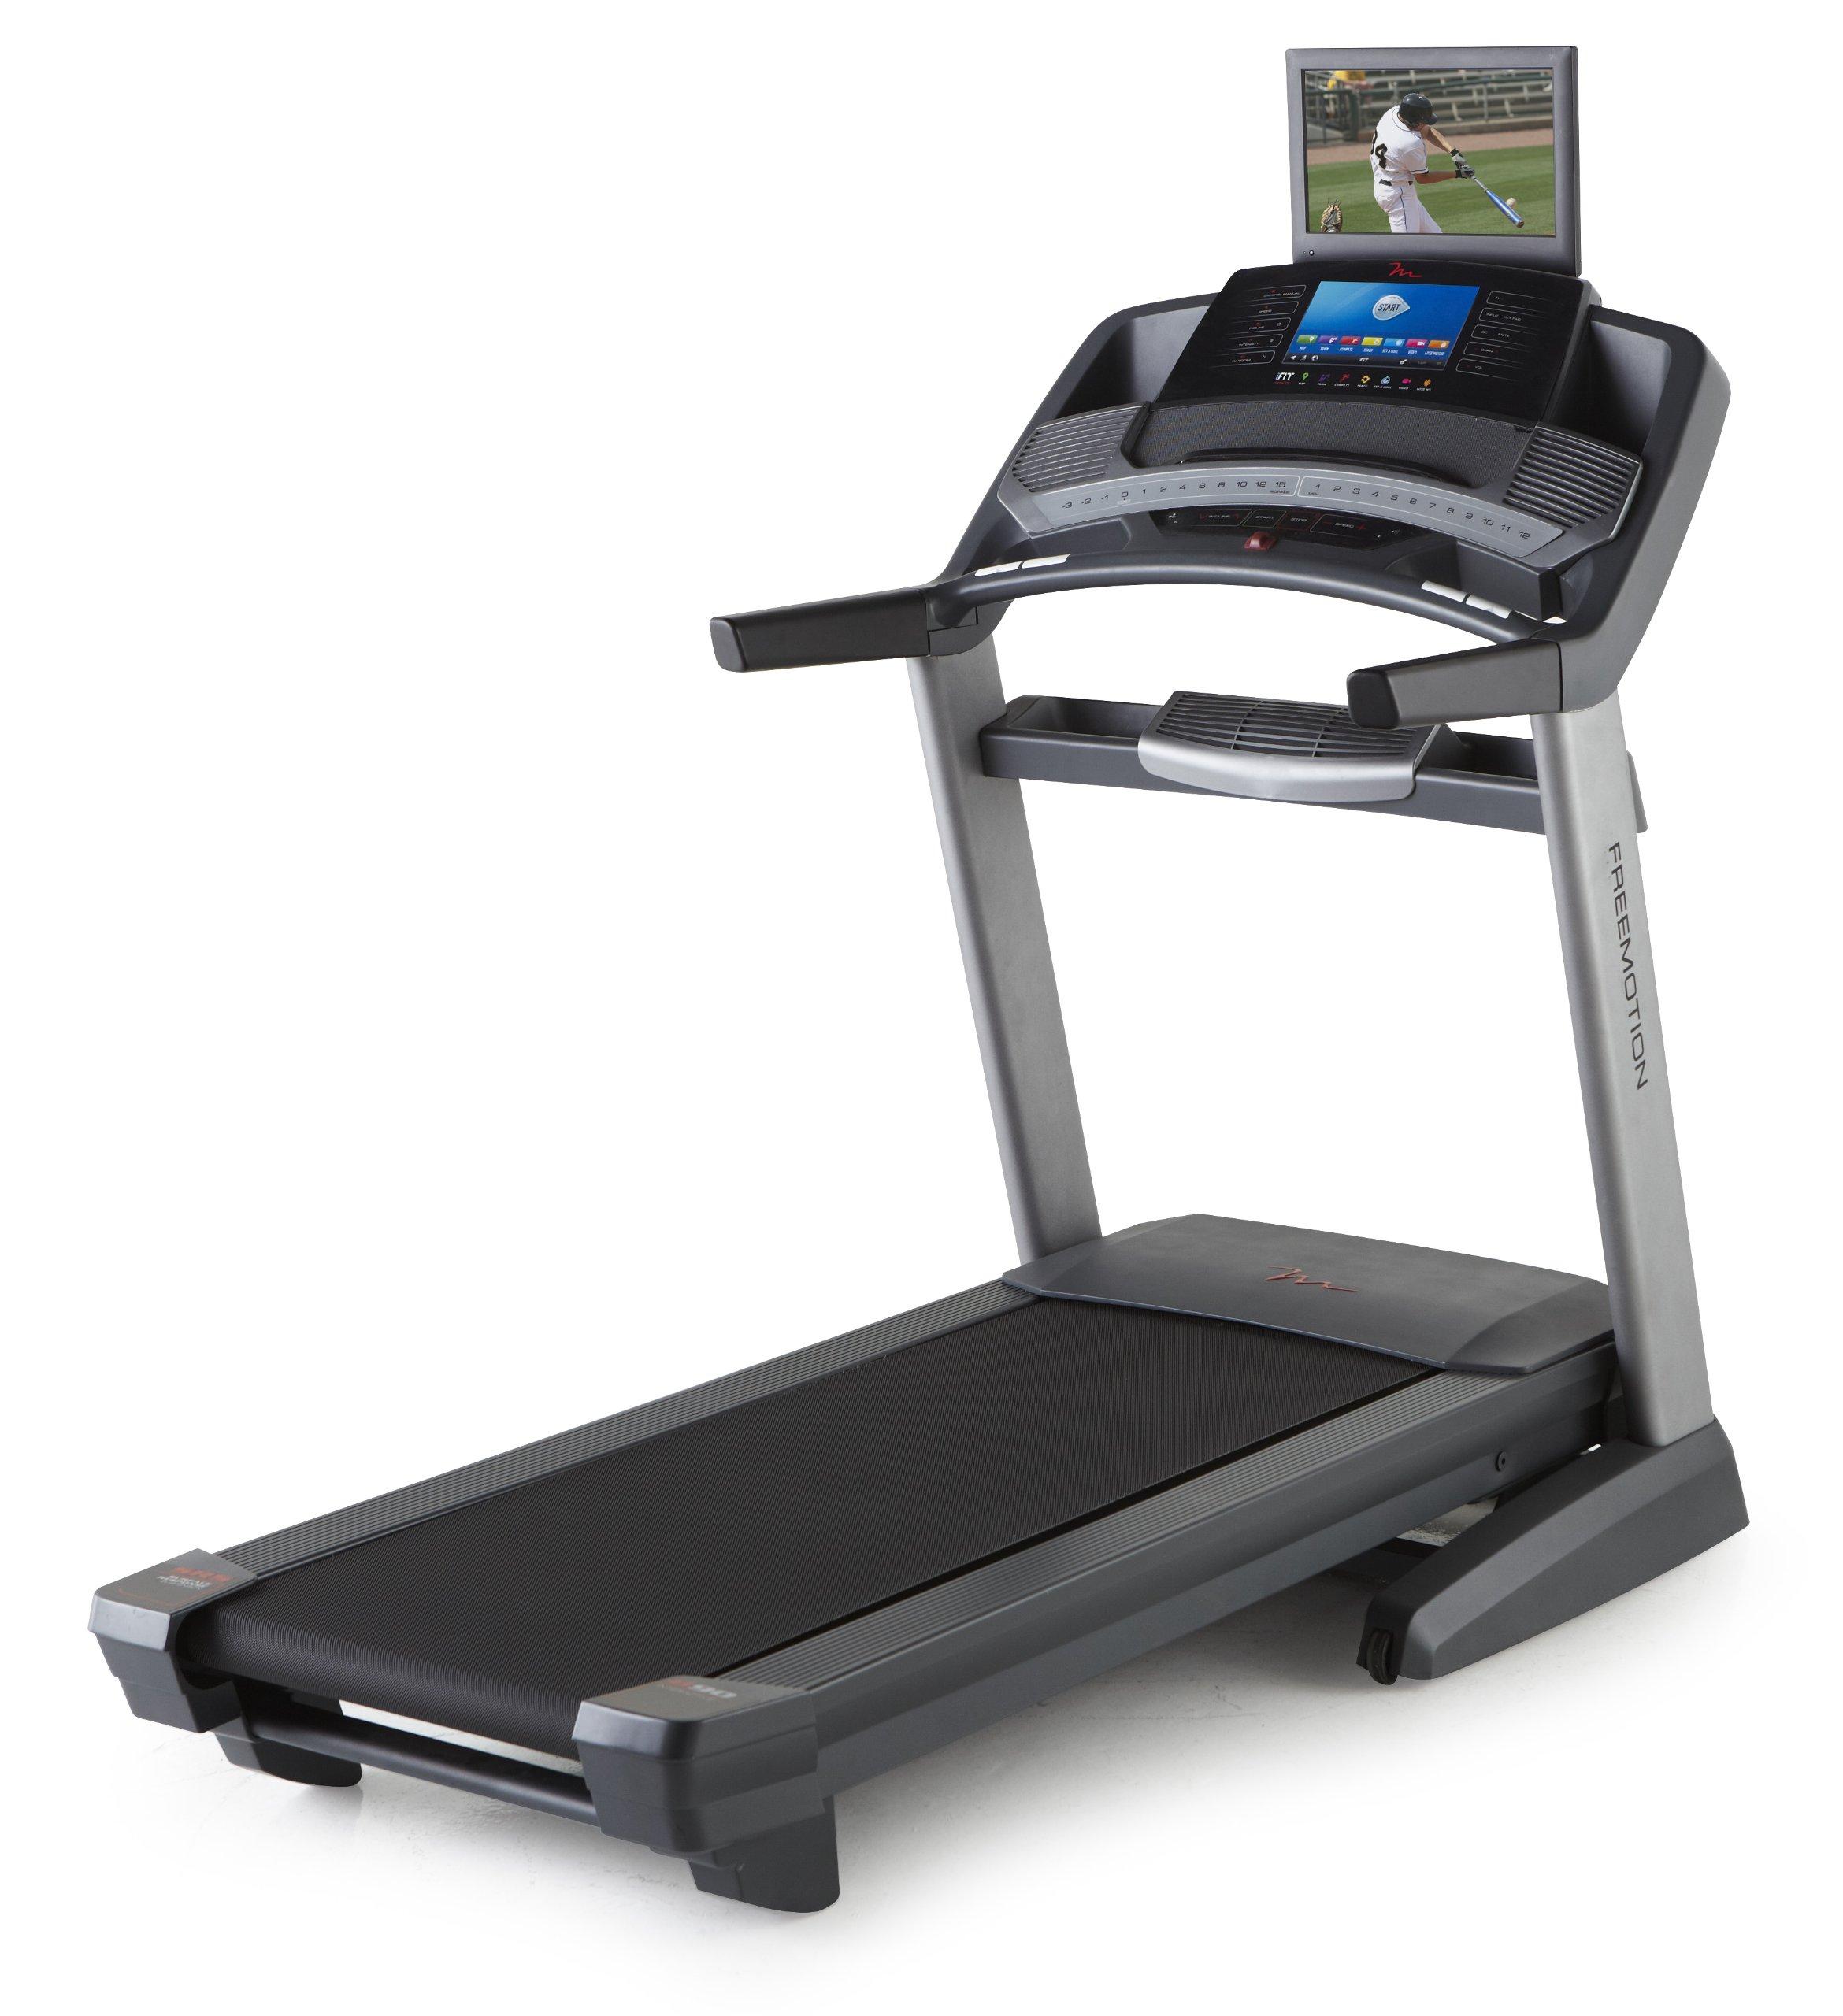 FreeMotion 890 Treadmill by FreeMotion